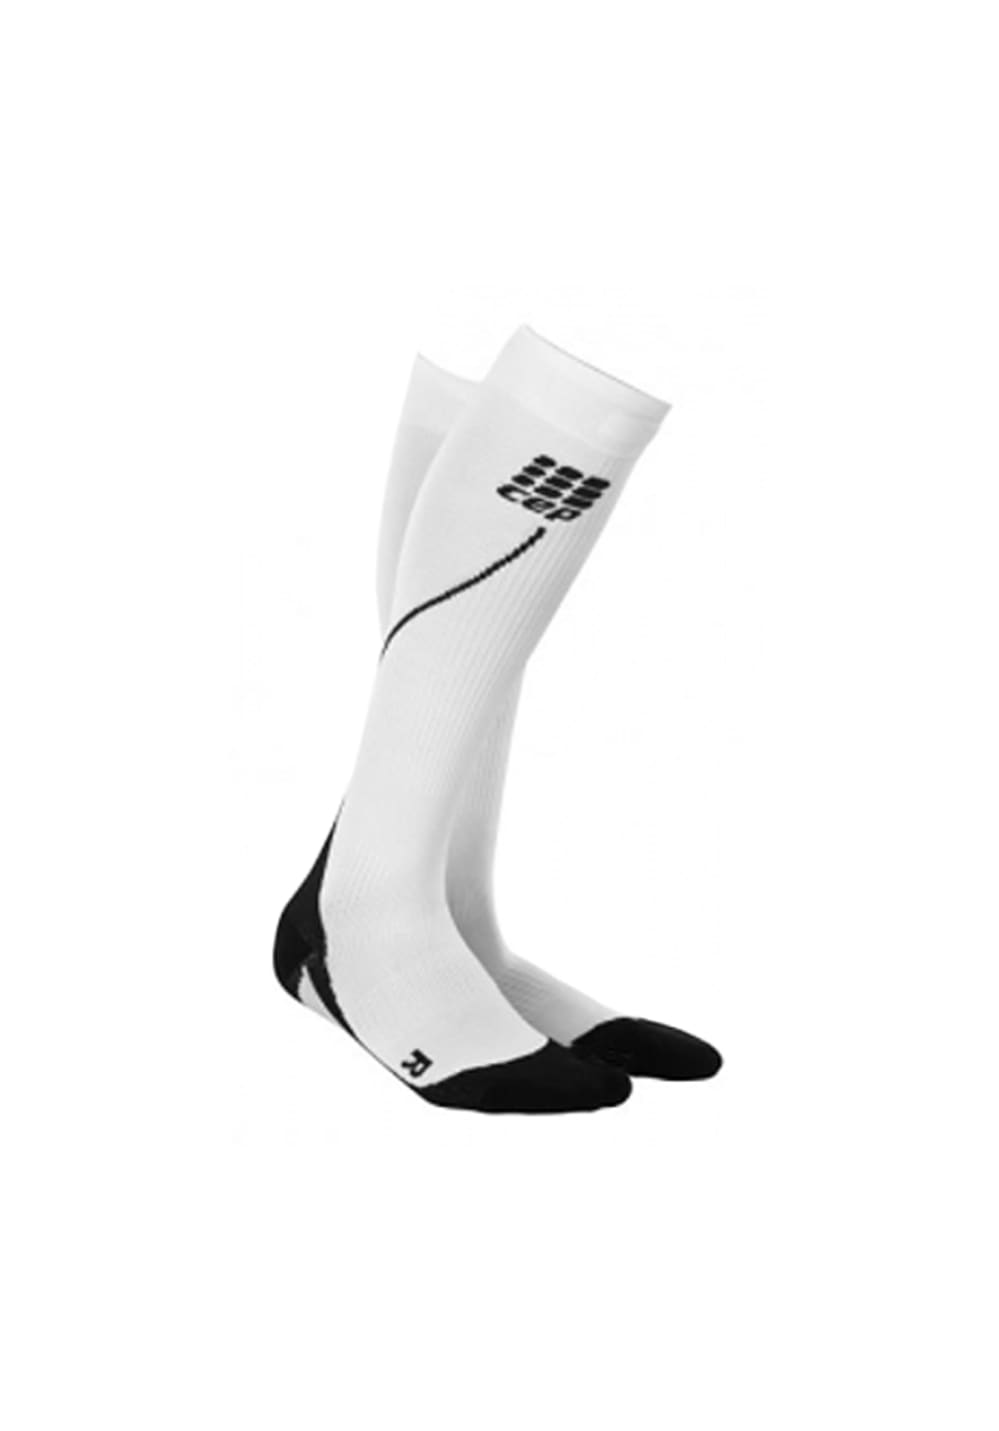 CEP Pro+ Run Socks 2.0 - Laufsocken für Damen - Weiß, Gr. S (II)